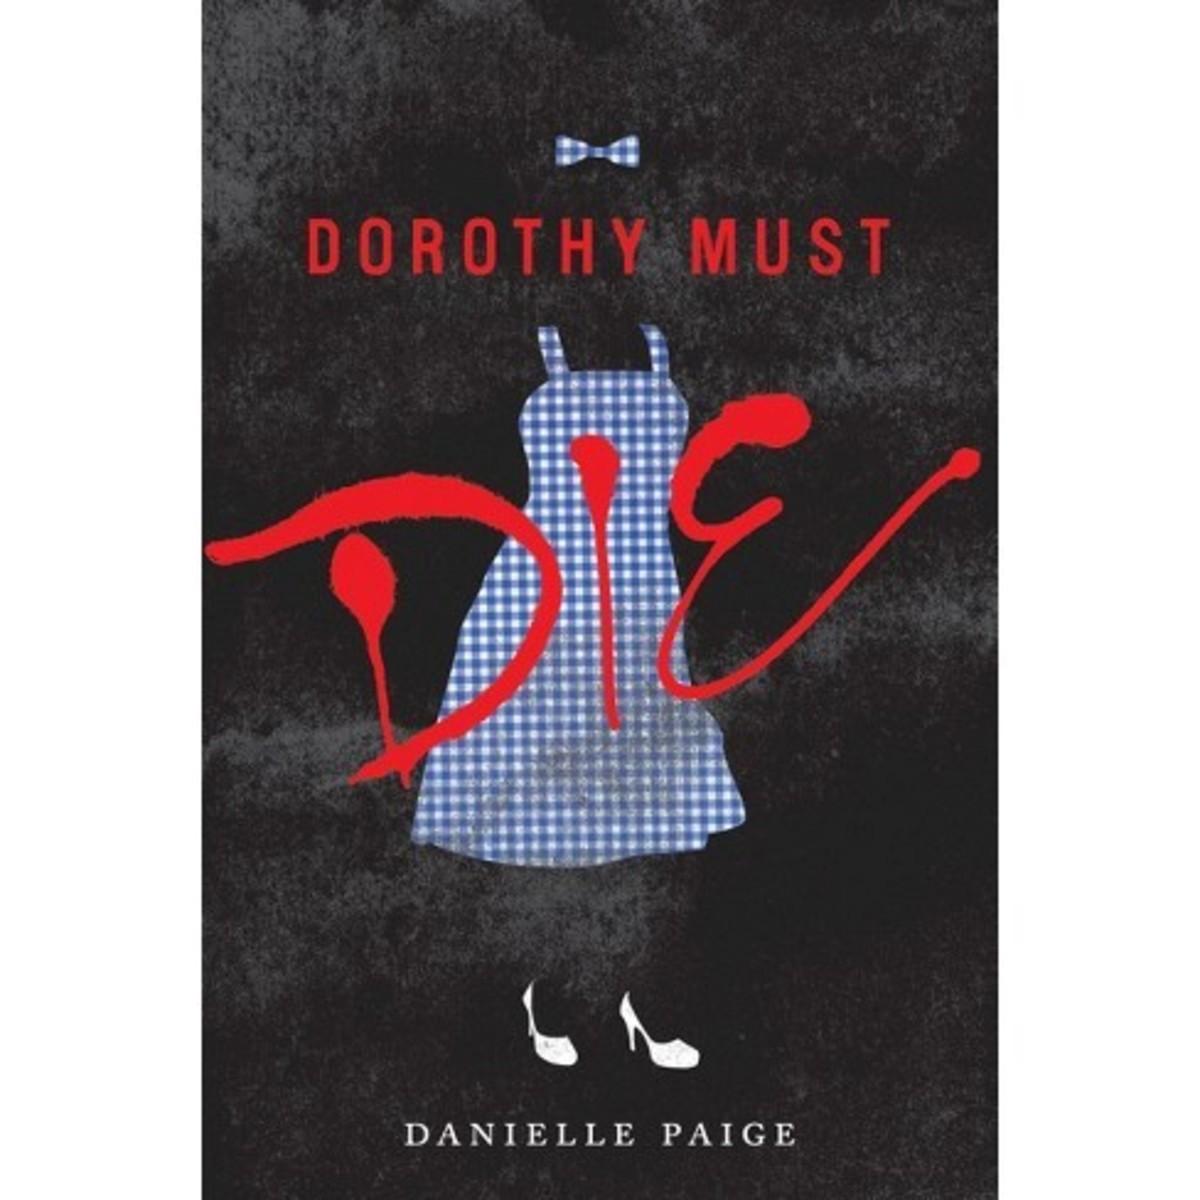 """Dorothy Must Die"" by Danielle Paige"